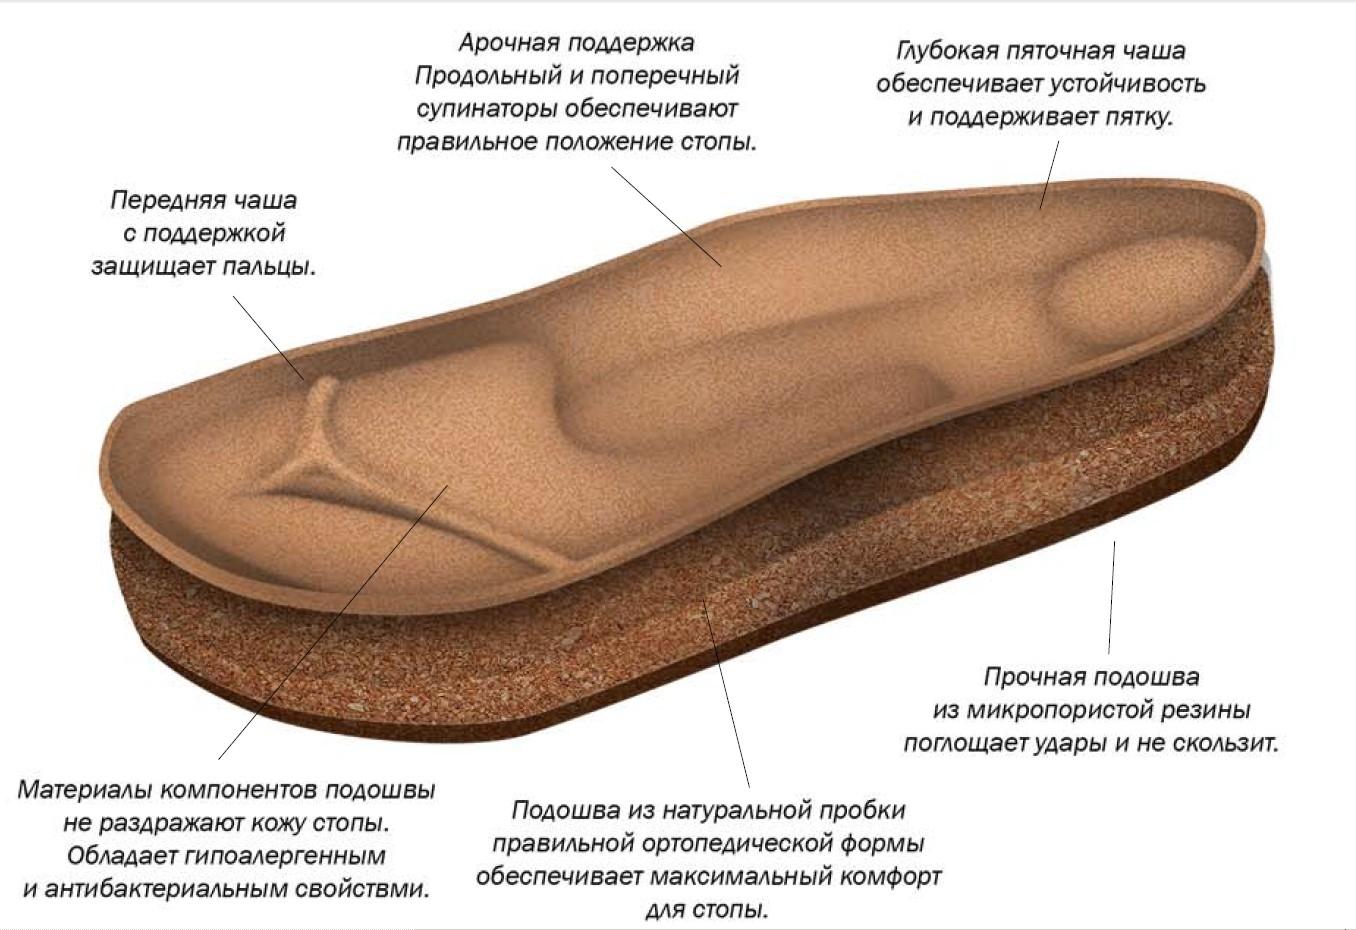 Orthopedic Slippers  07-062 - 2